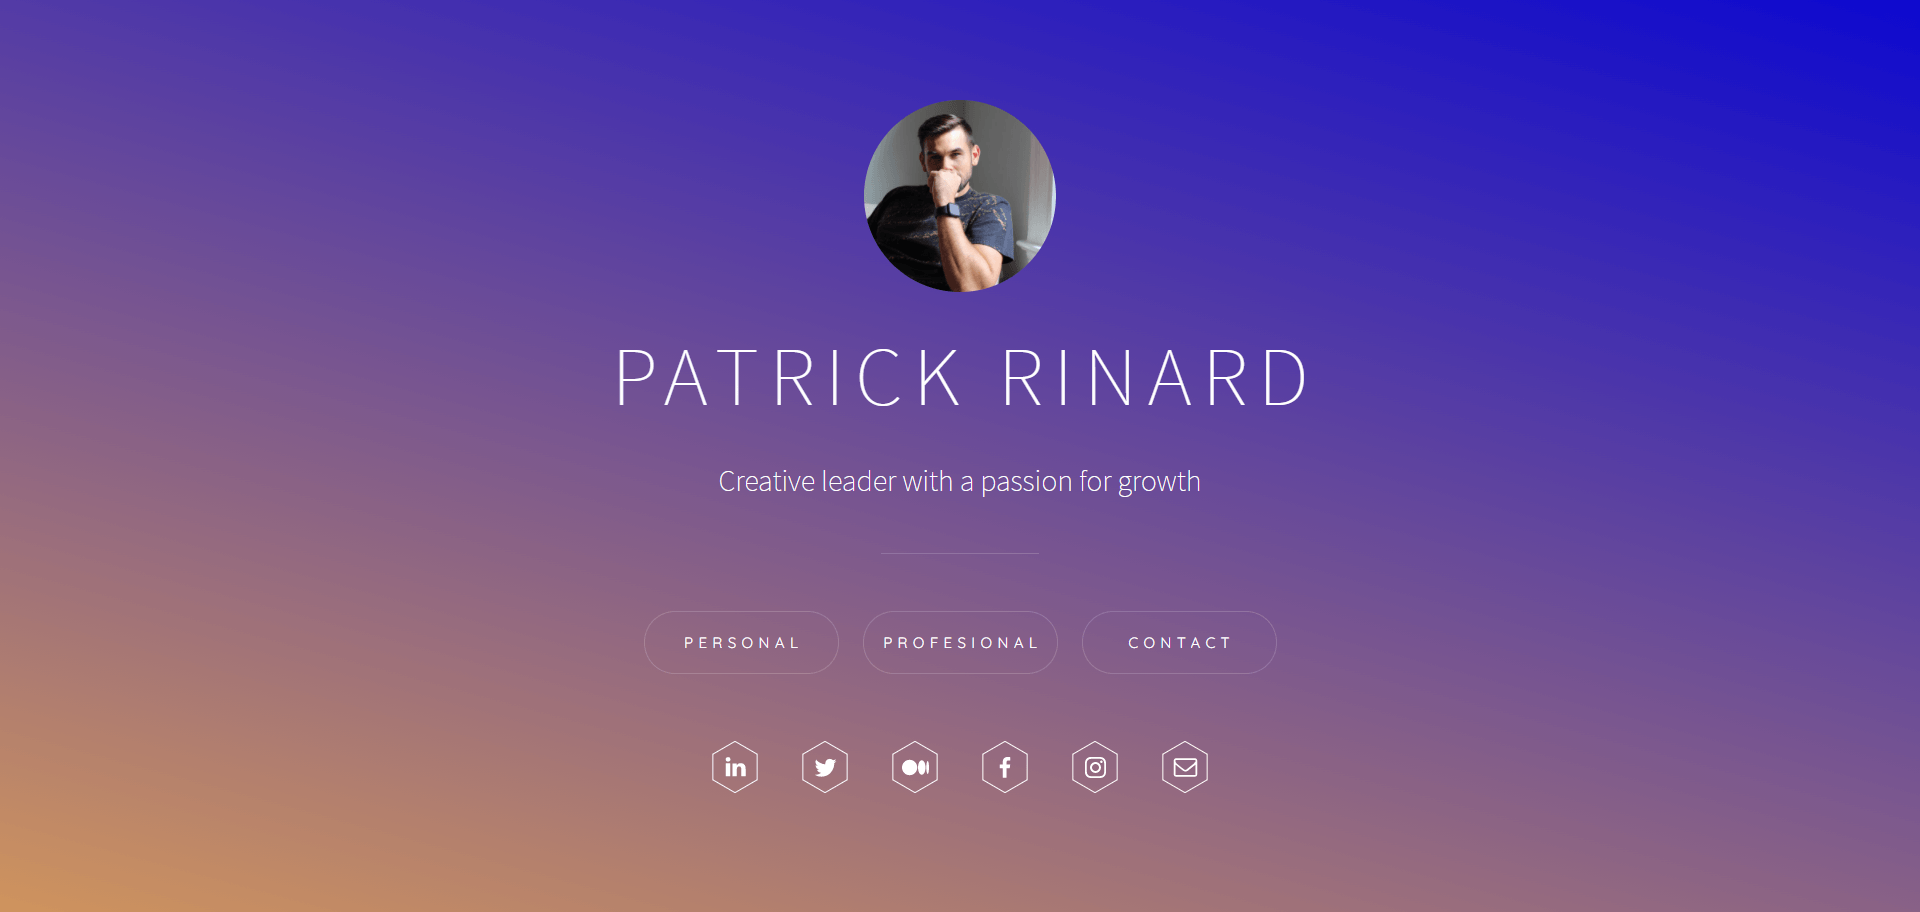 Patrick Rinard